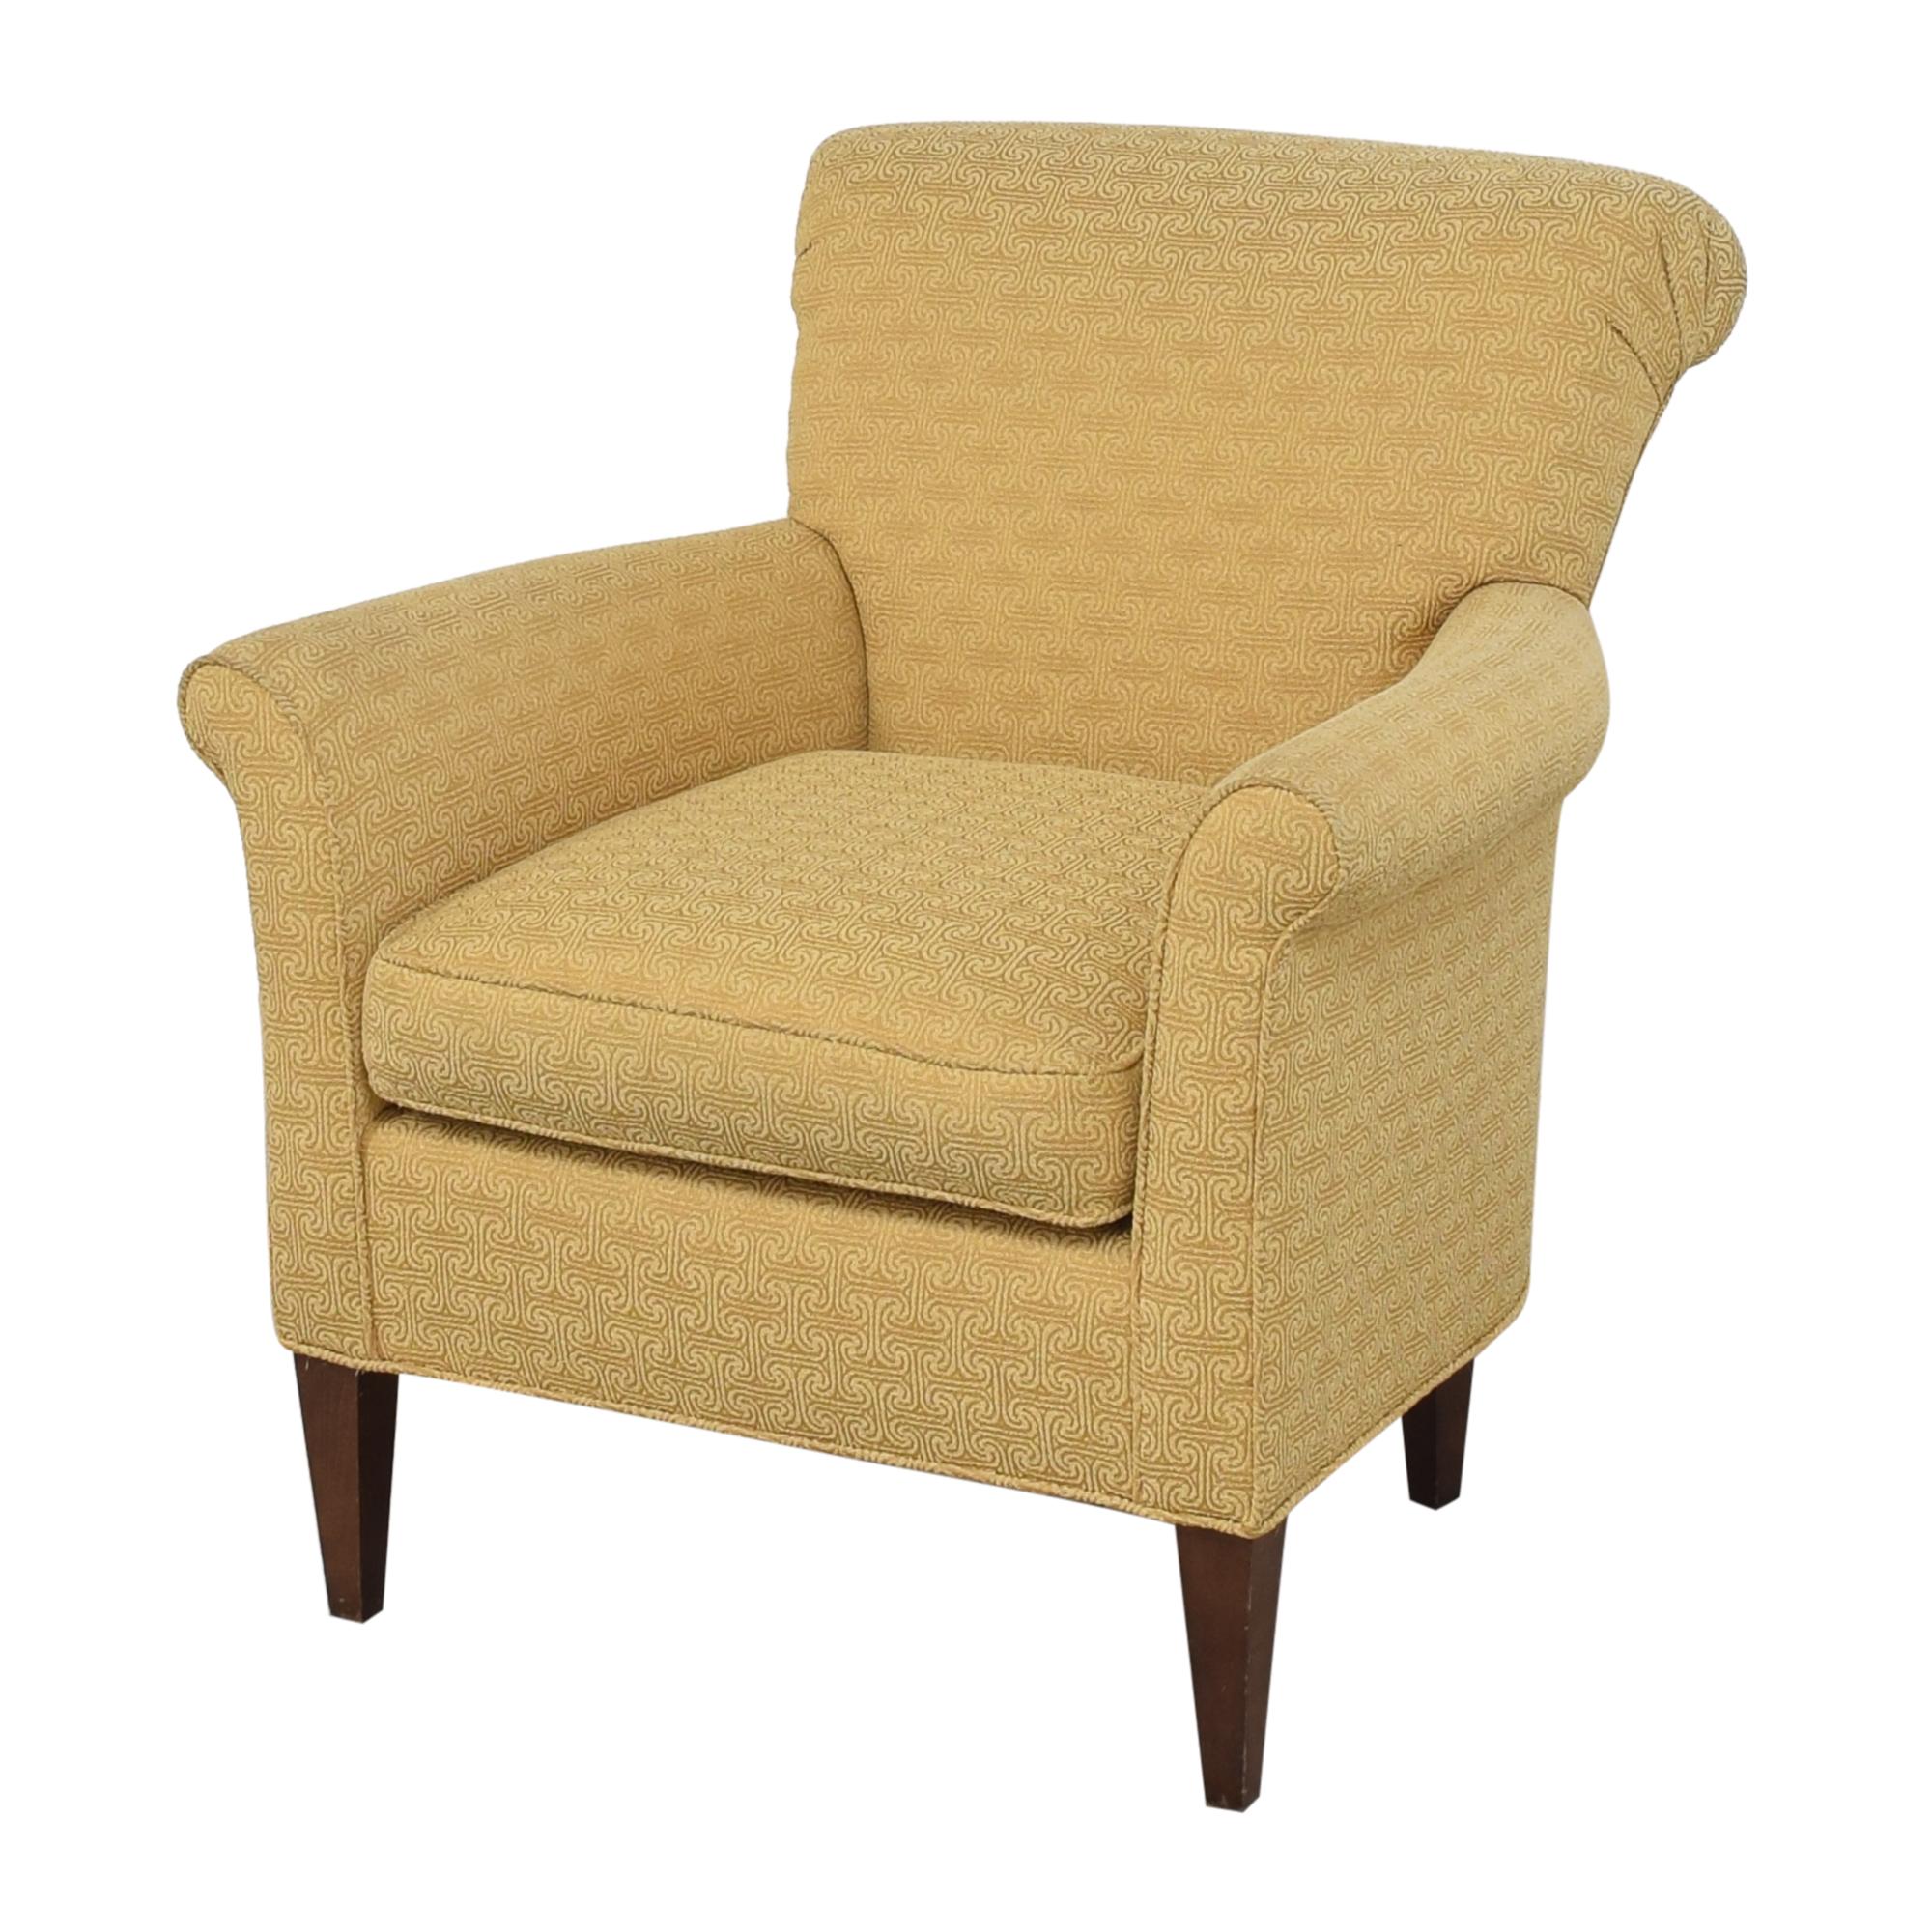 shop Ethan Allen Scroll Back Accent Chair Ethan Allen Chairs